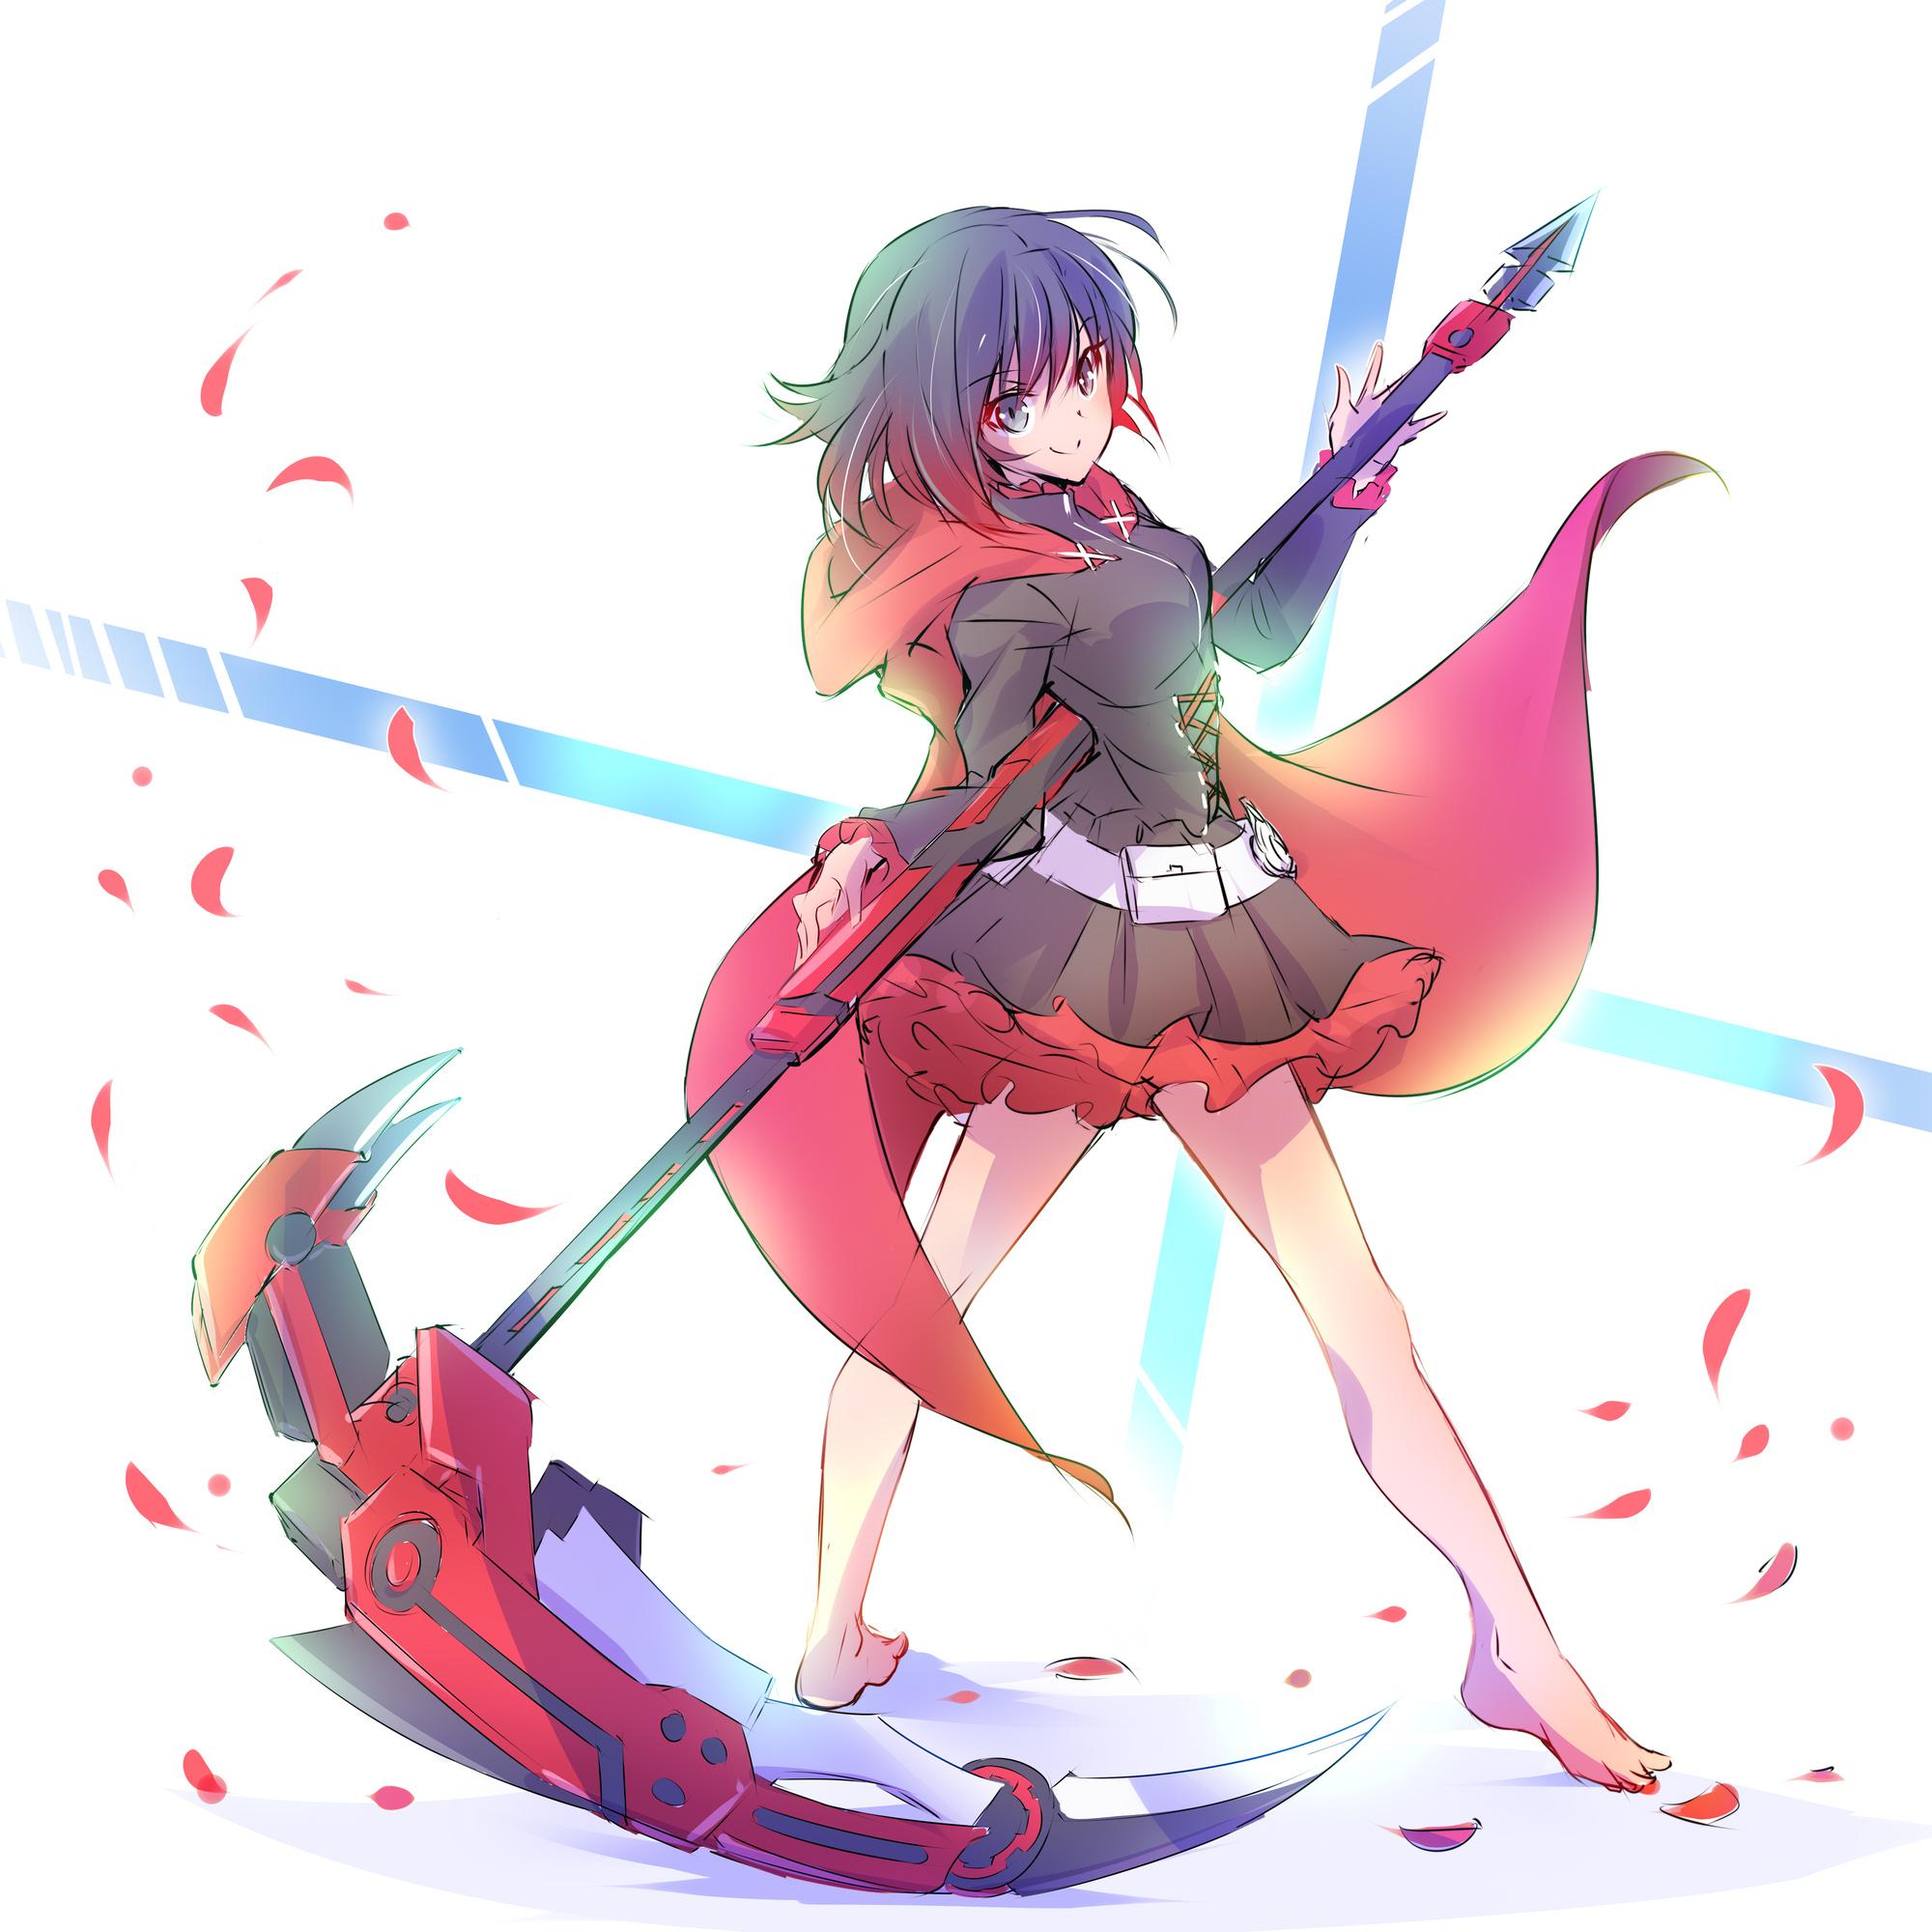 Ruby rose rwby image 2252844 zerochan anime image board - Rwby ruby rose fanart ...